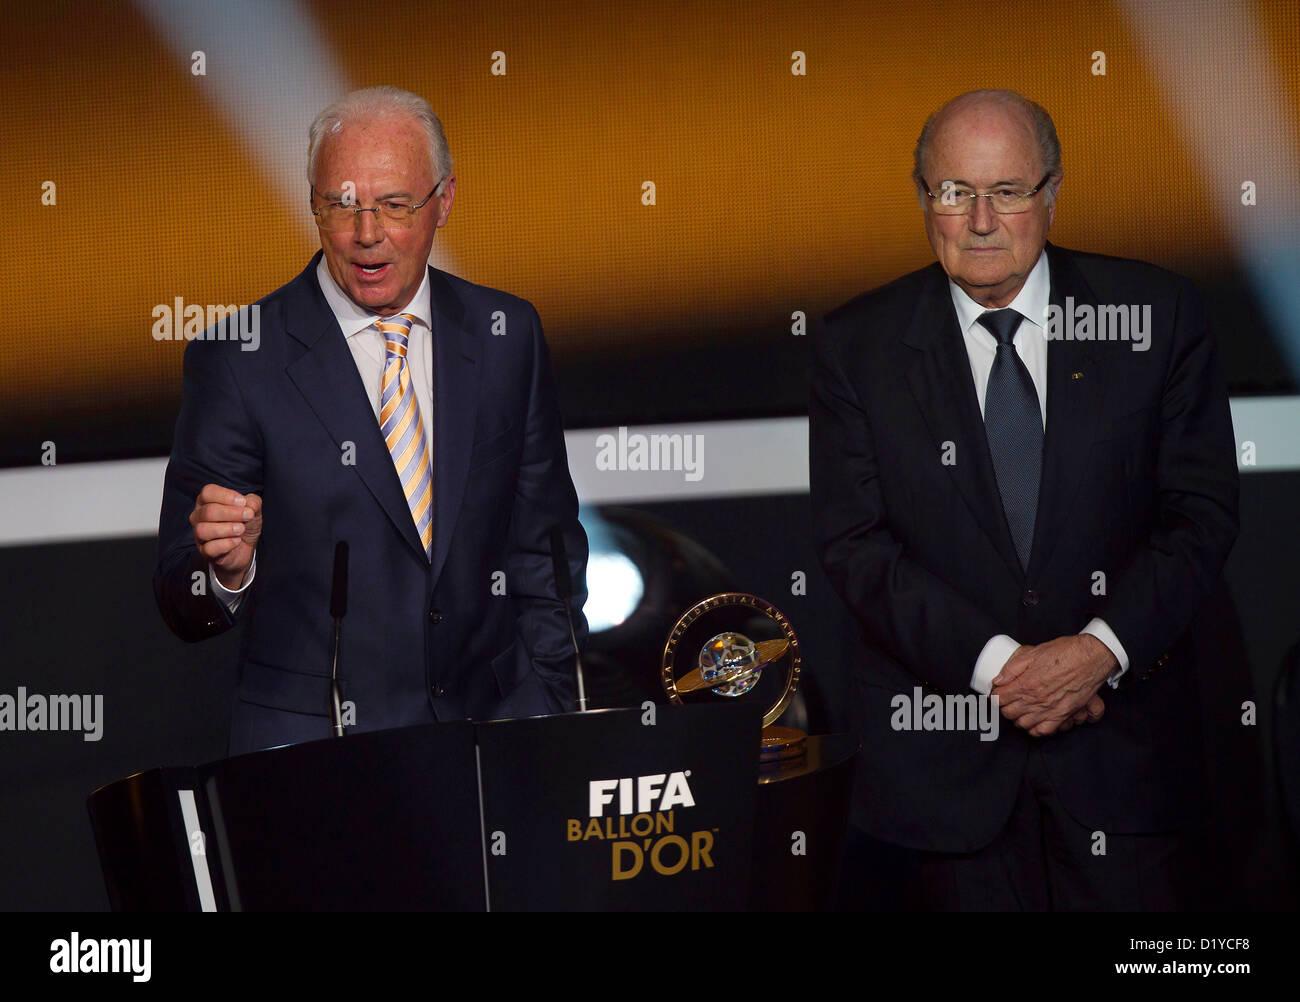 Franz Beckenbauer and Joseph Blatter, during FIFA Ballon d'Or Gala 2012 at the Kongresshaus on January 7, 2013 - Stock Image